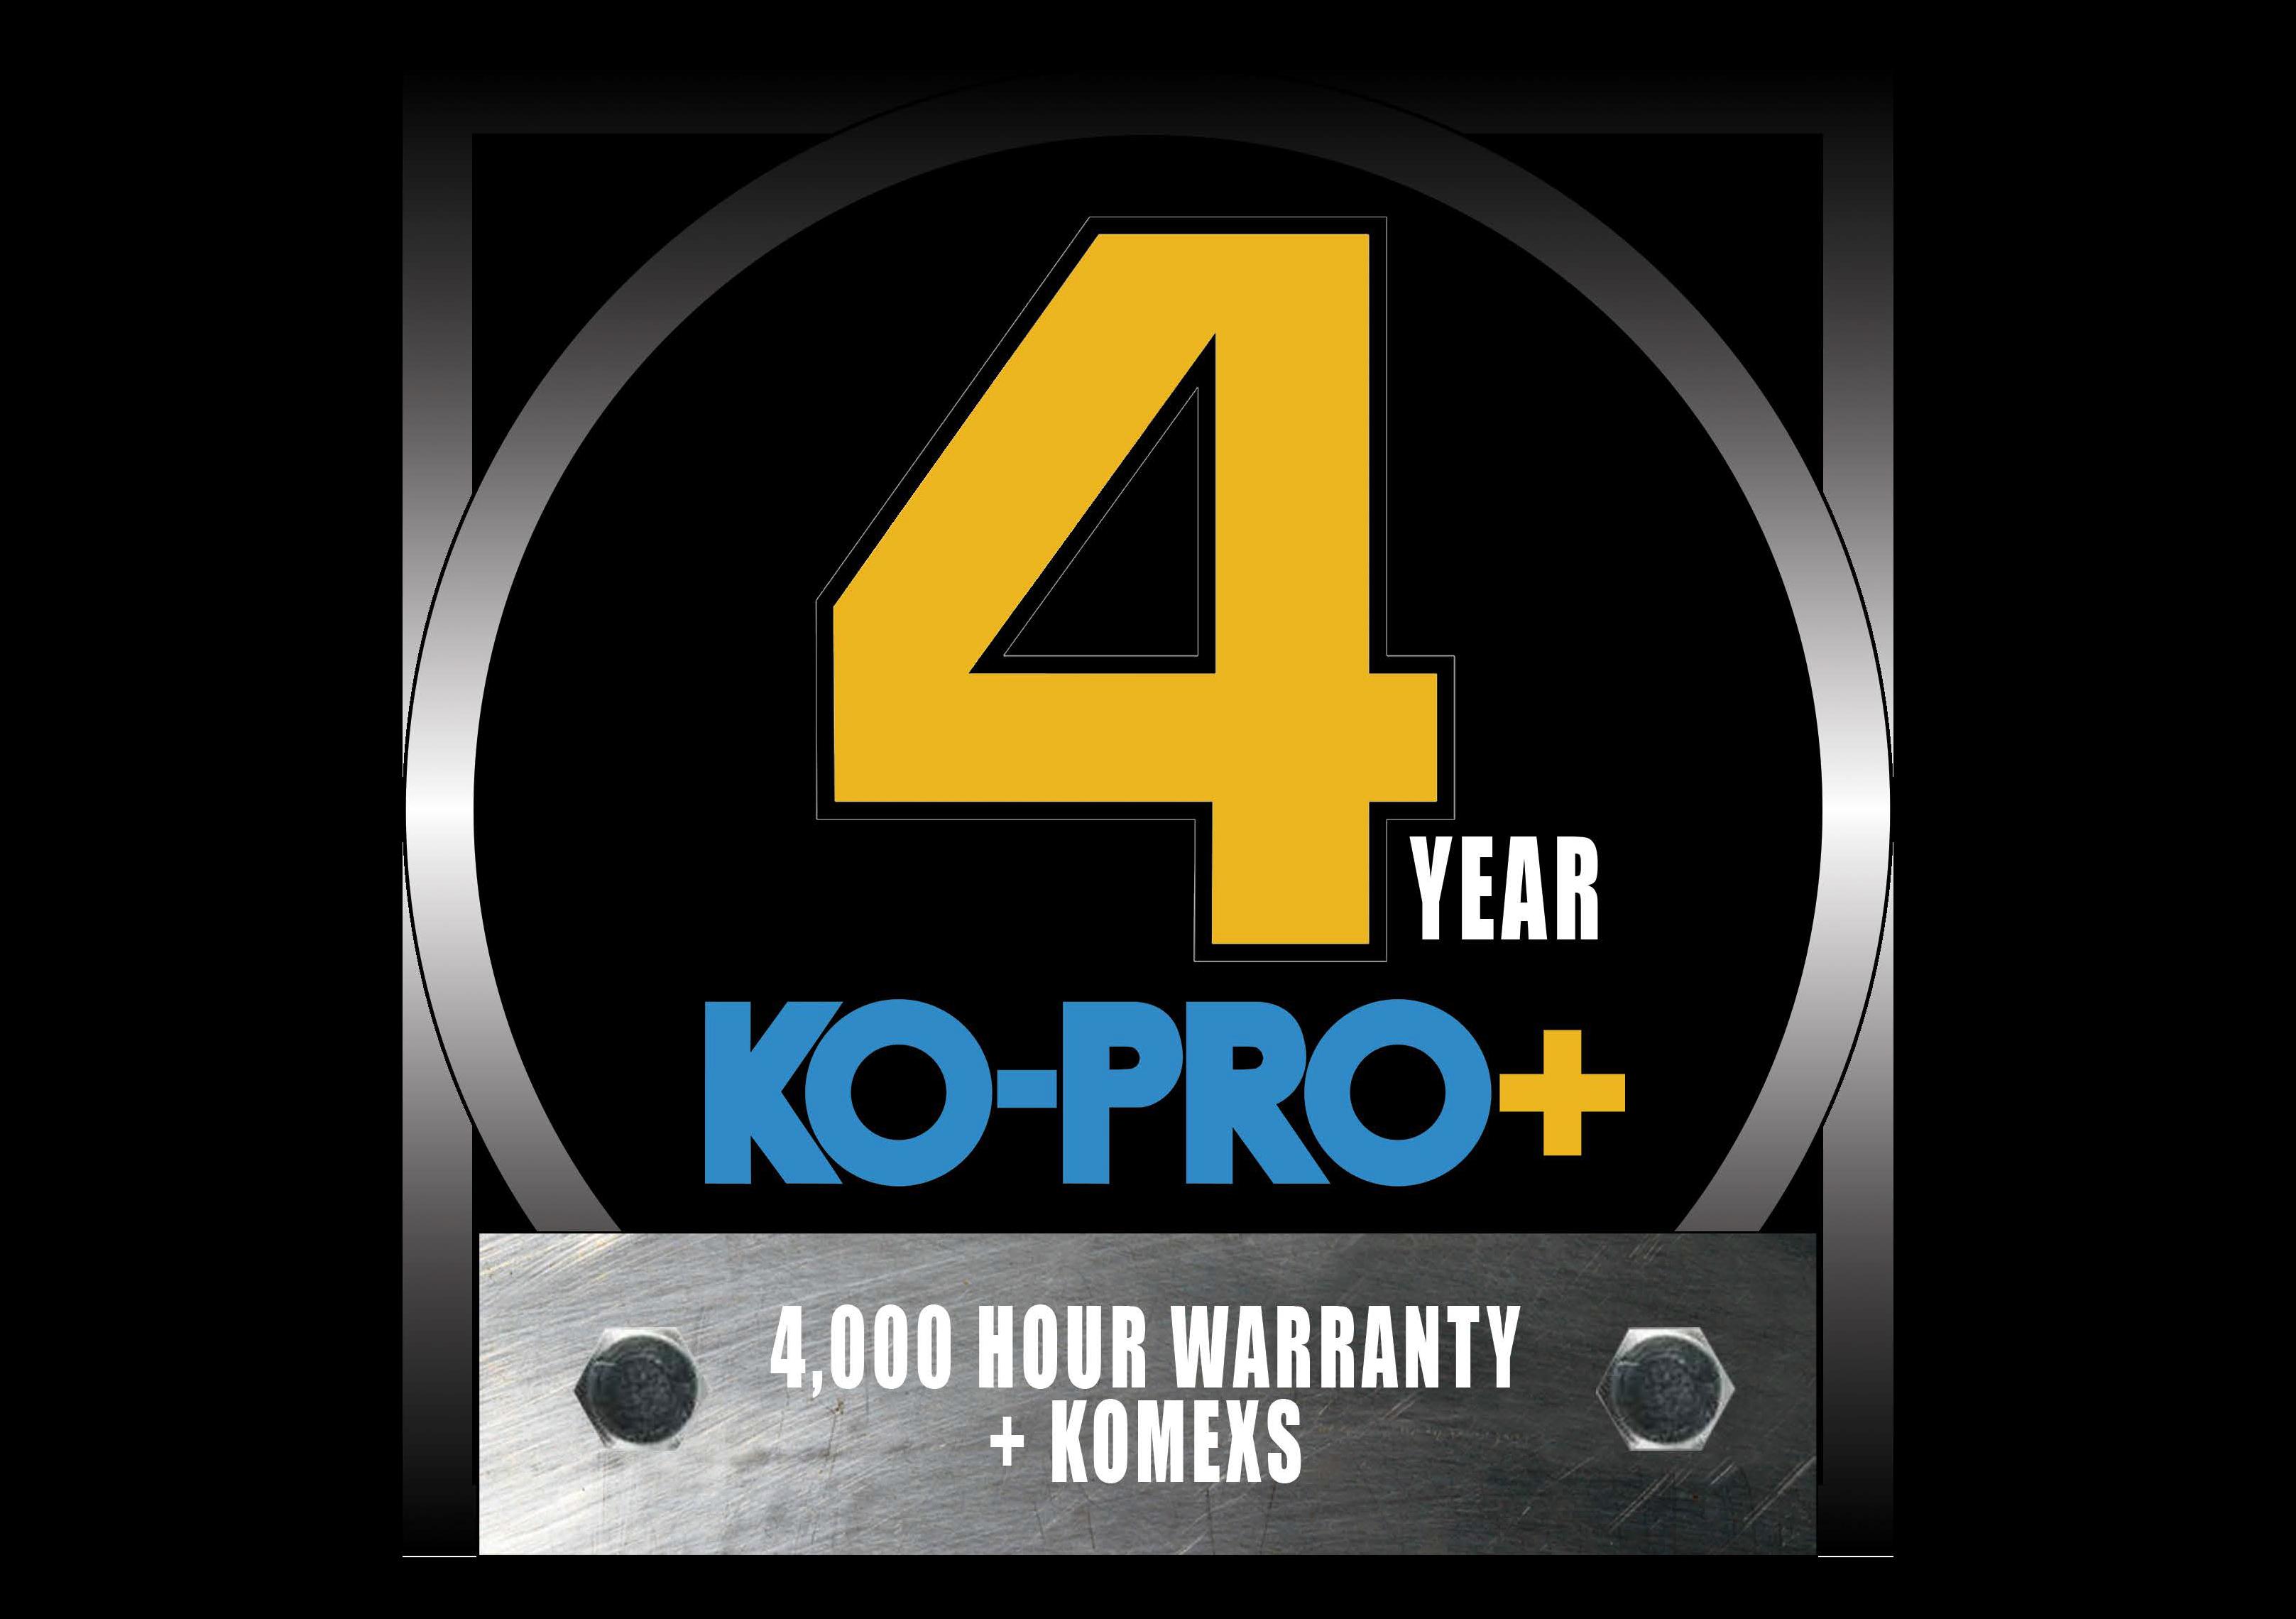 Genuine Parts, Reliable Service & Powerful Warranty